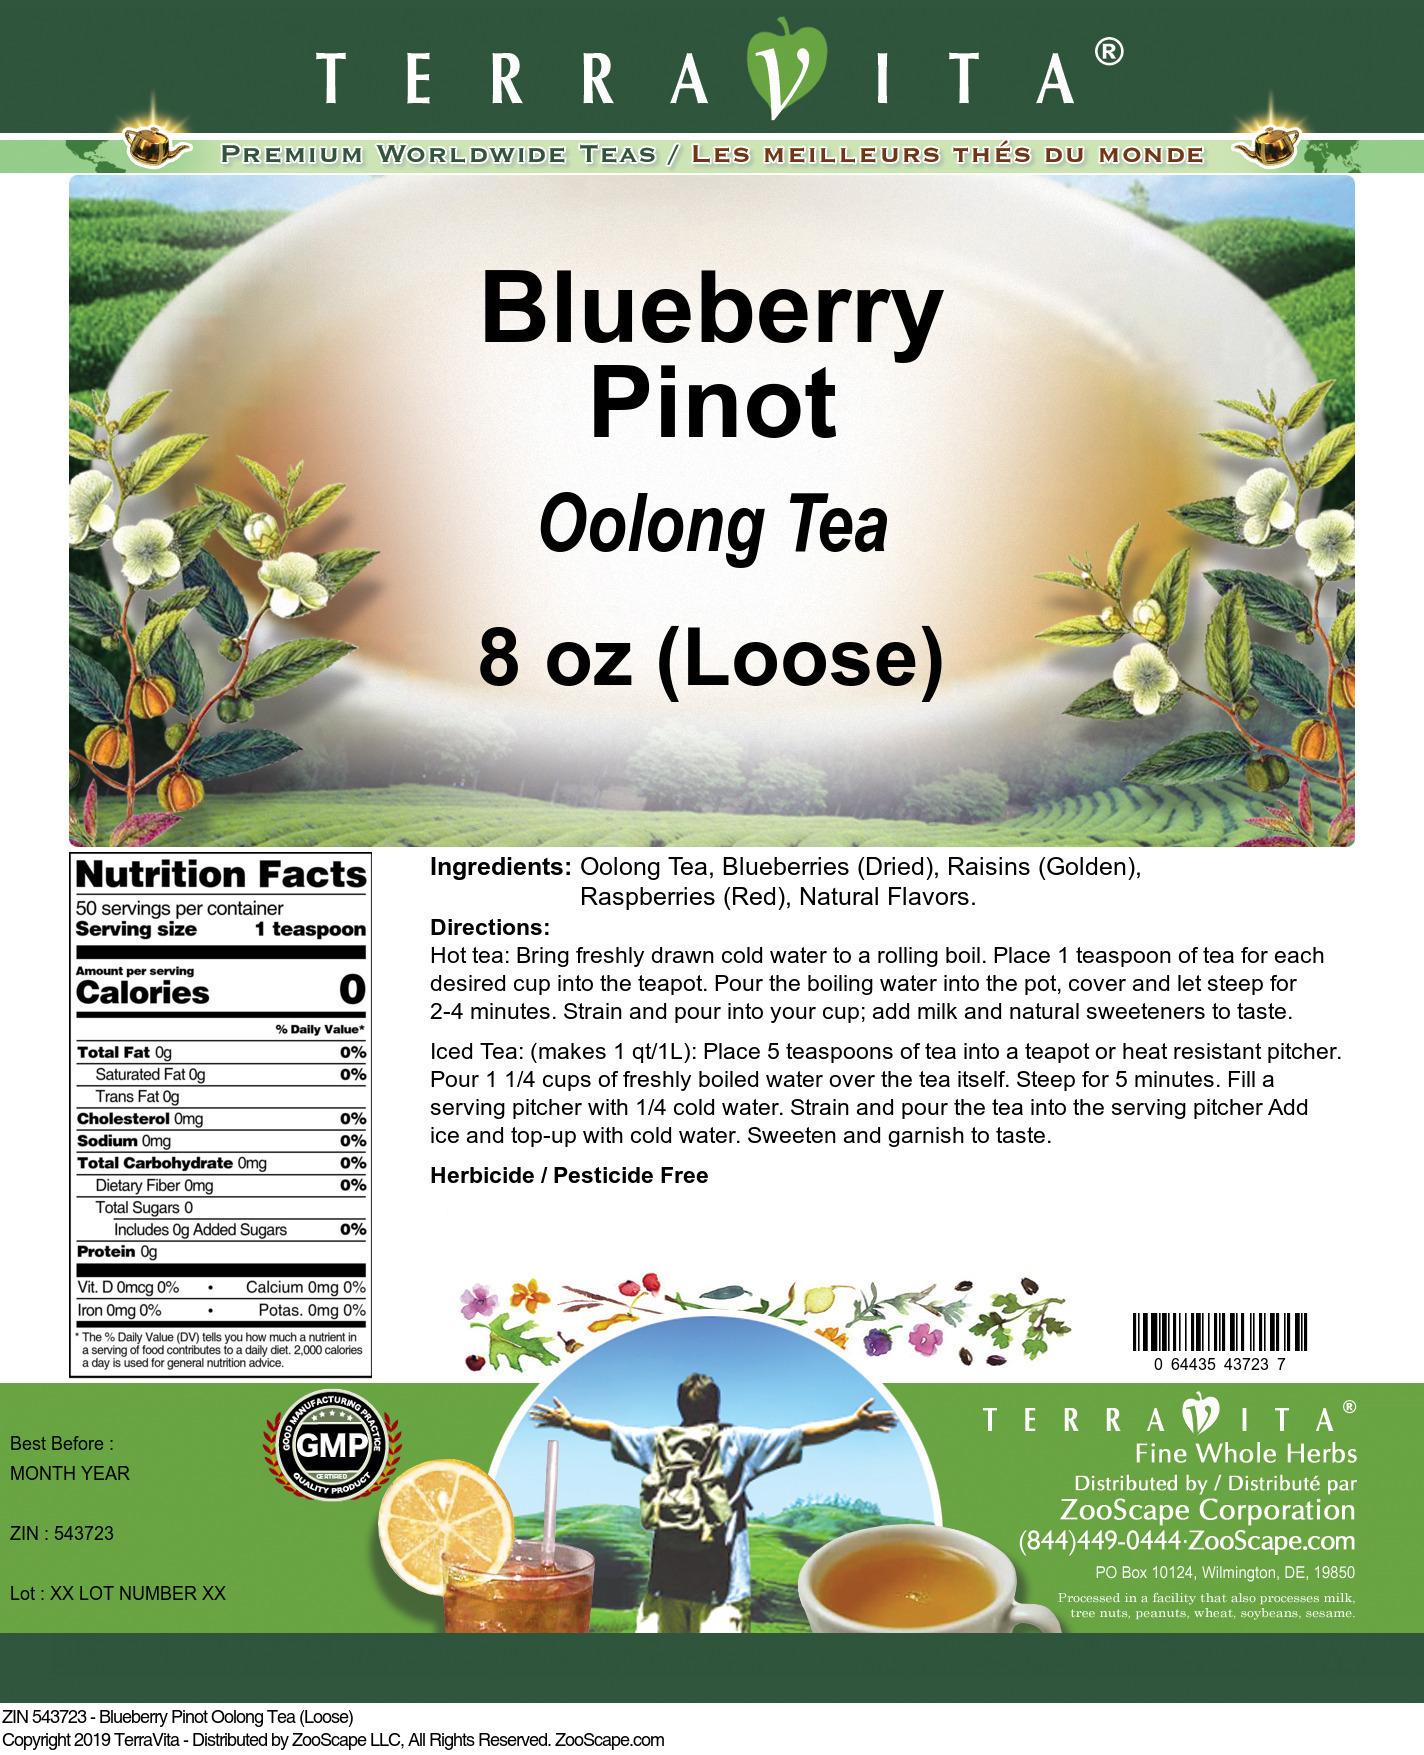 Blueberry Pinot Oolong Tea (Loose)